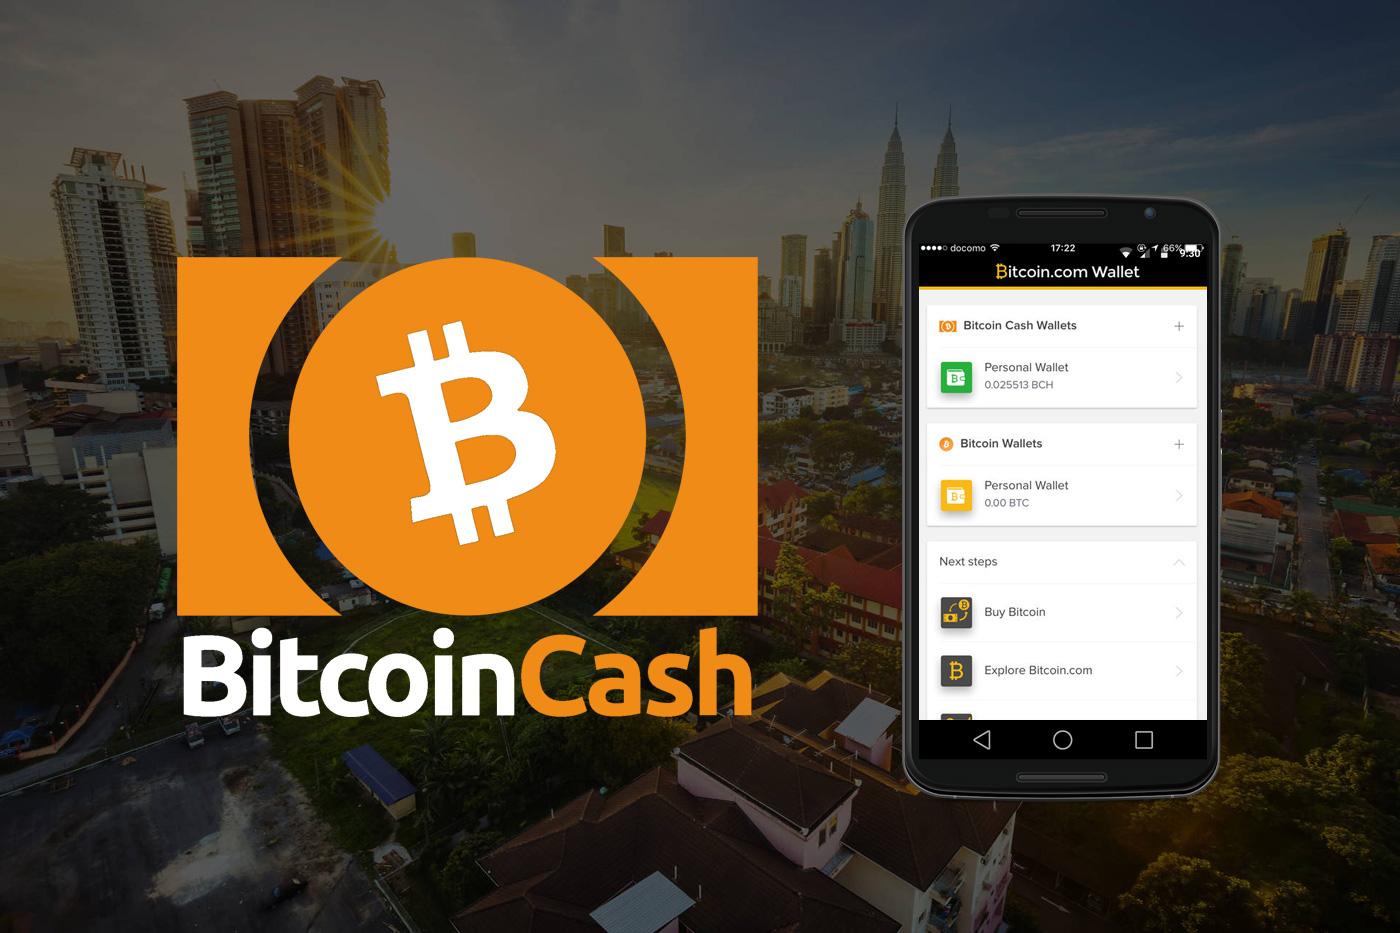 Bitcoin Cash Desktop Wallet